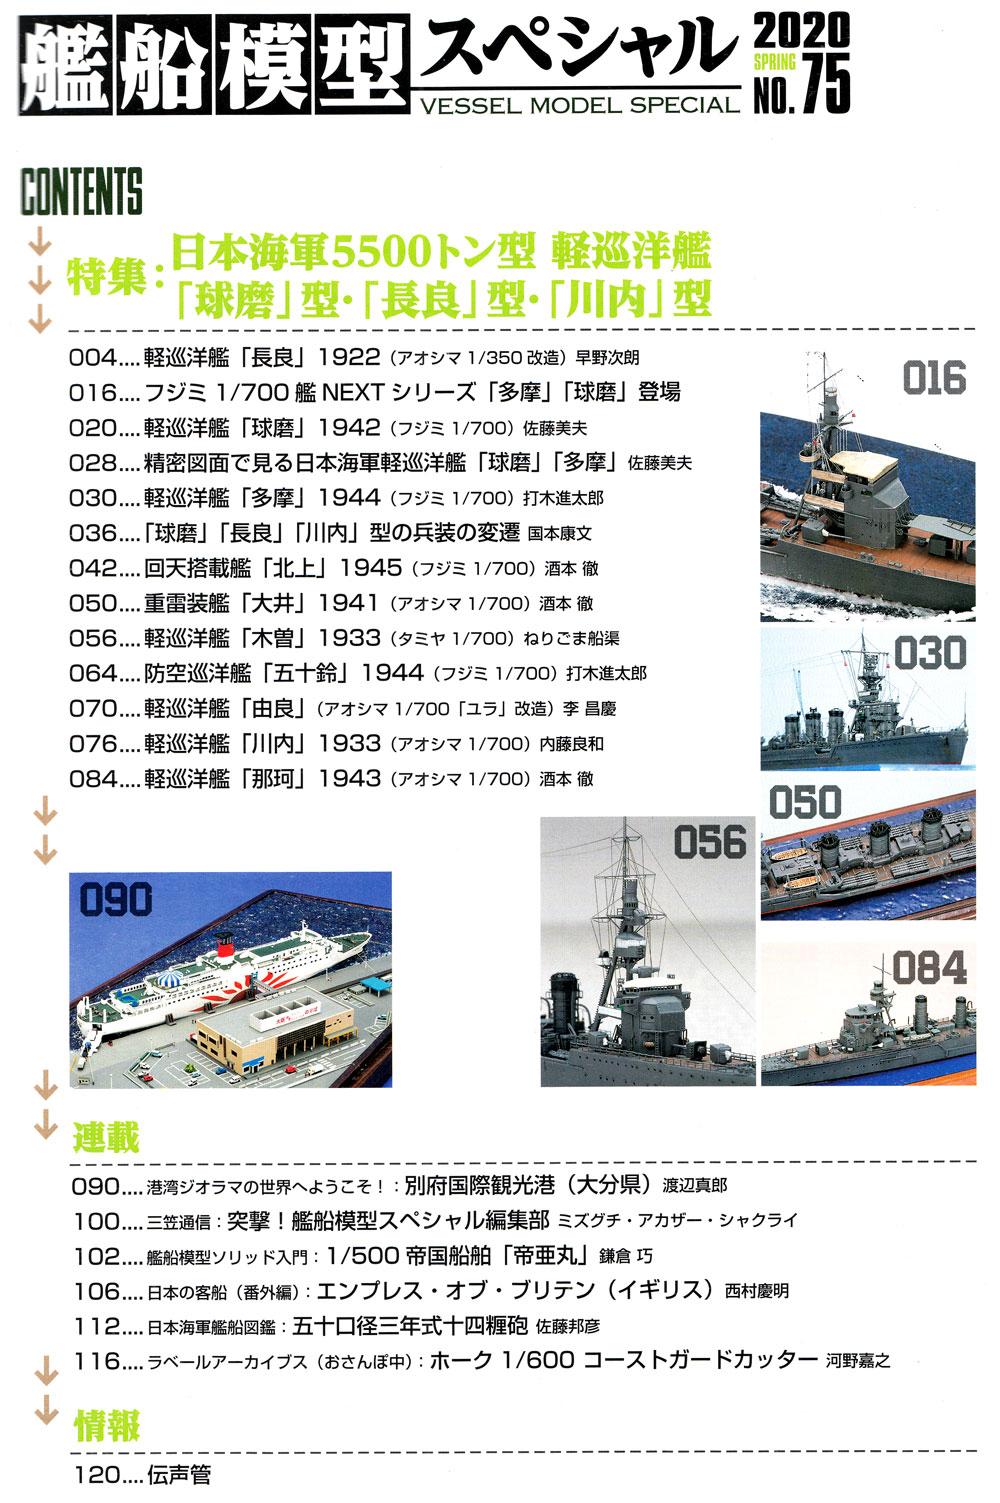 艦船模型スペシャル No.75 日本海軍 5500トン型 軽巡洋艦 球磨型・長良型・川内型本(モデルアート艦船模型スペシャルNo.075)商品画像_1